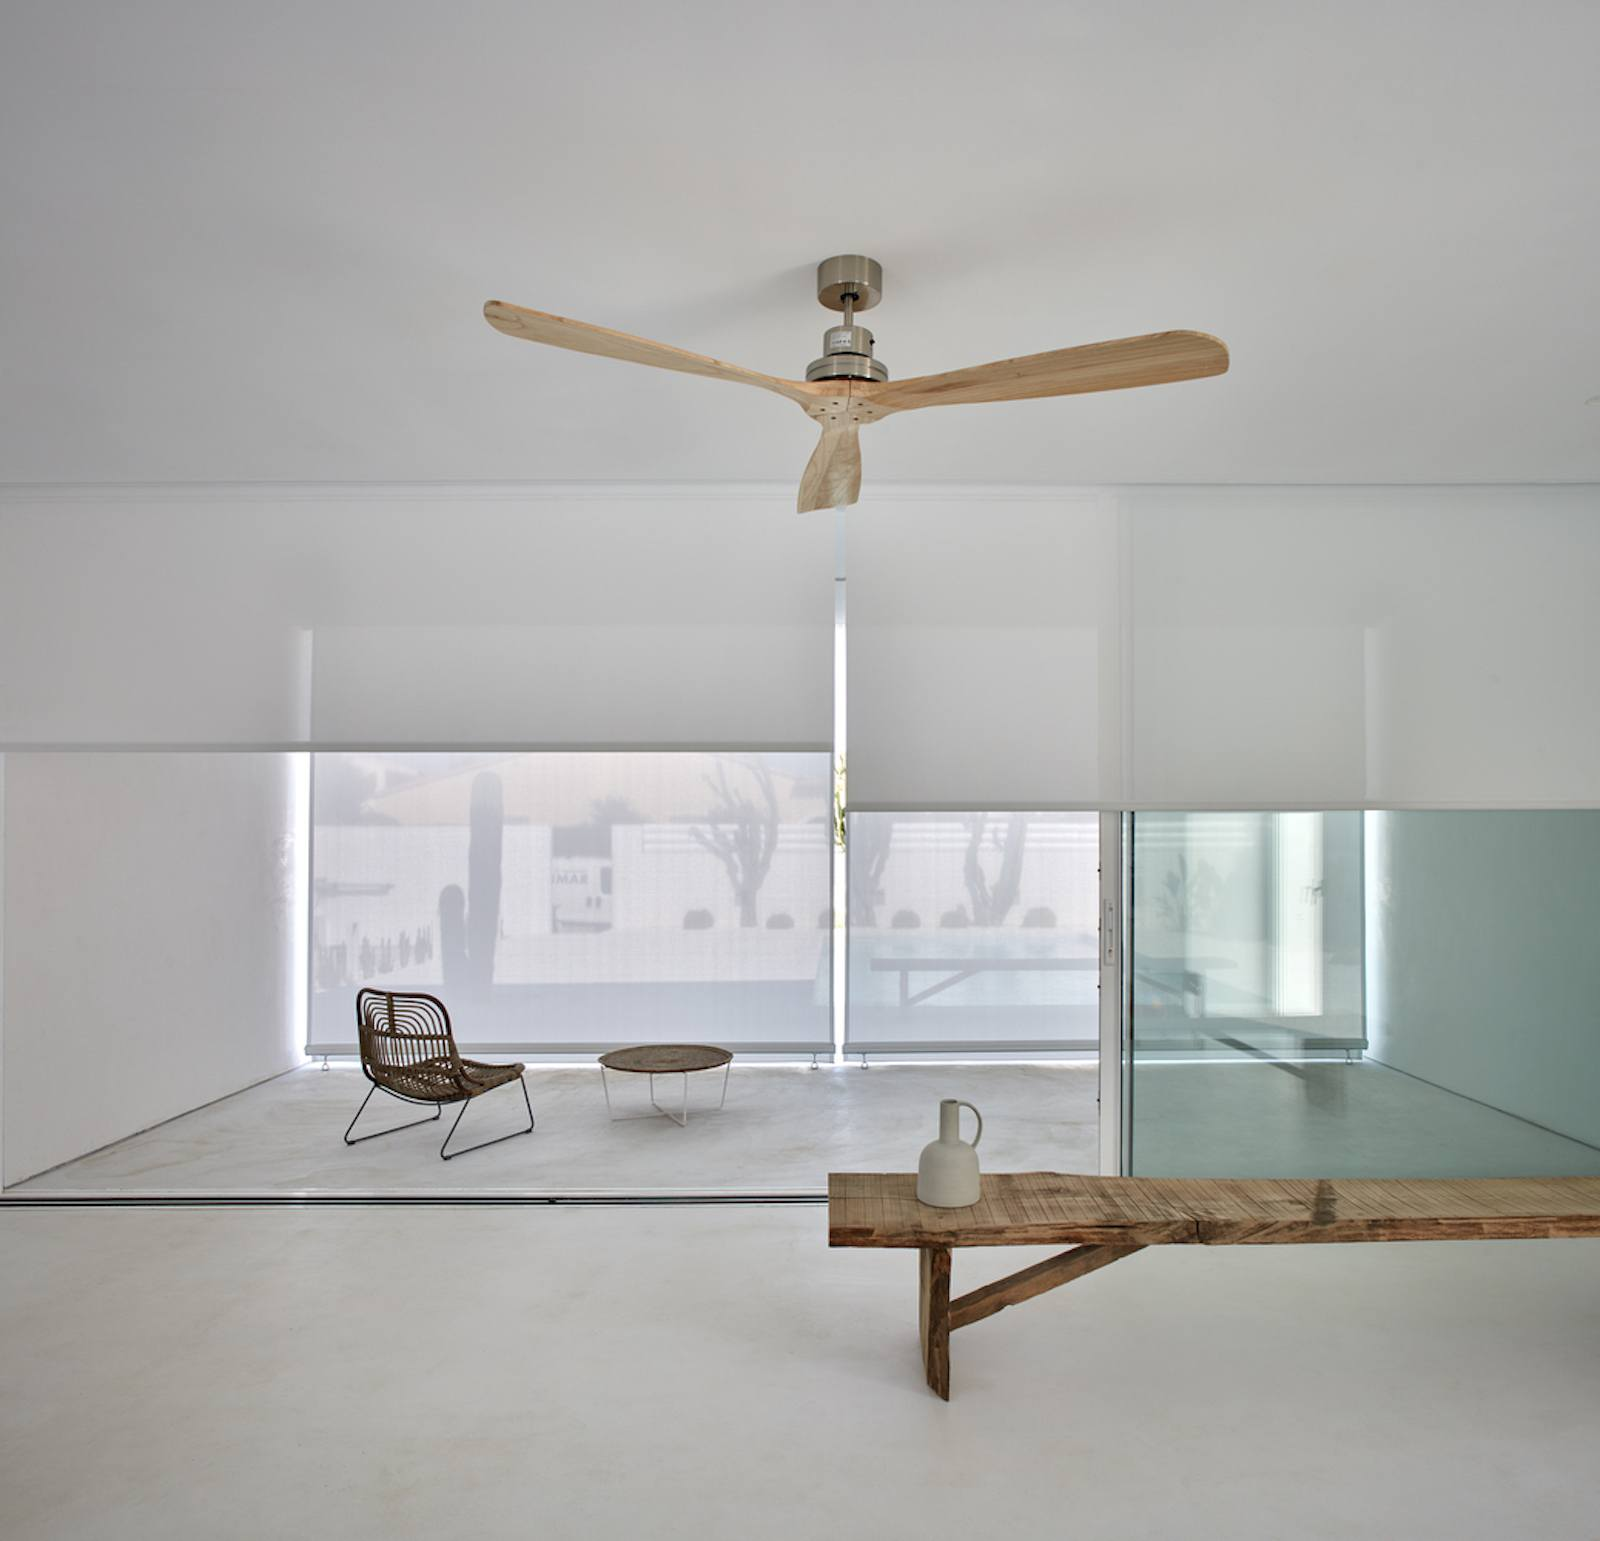 IGNANT-Architecture-Carles-Faus-Arquitectura-Carmen-House-002